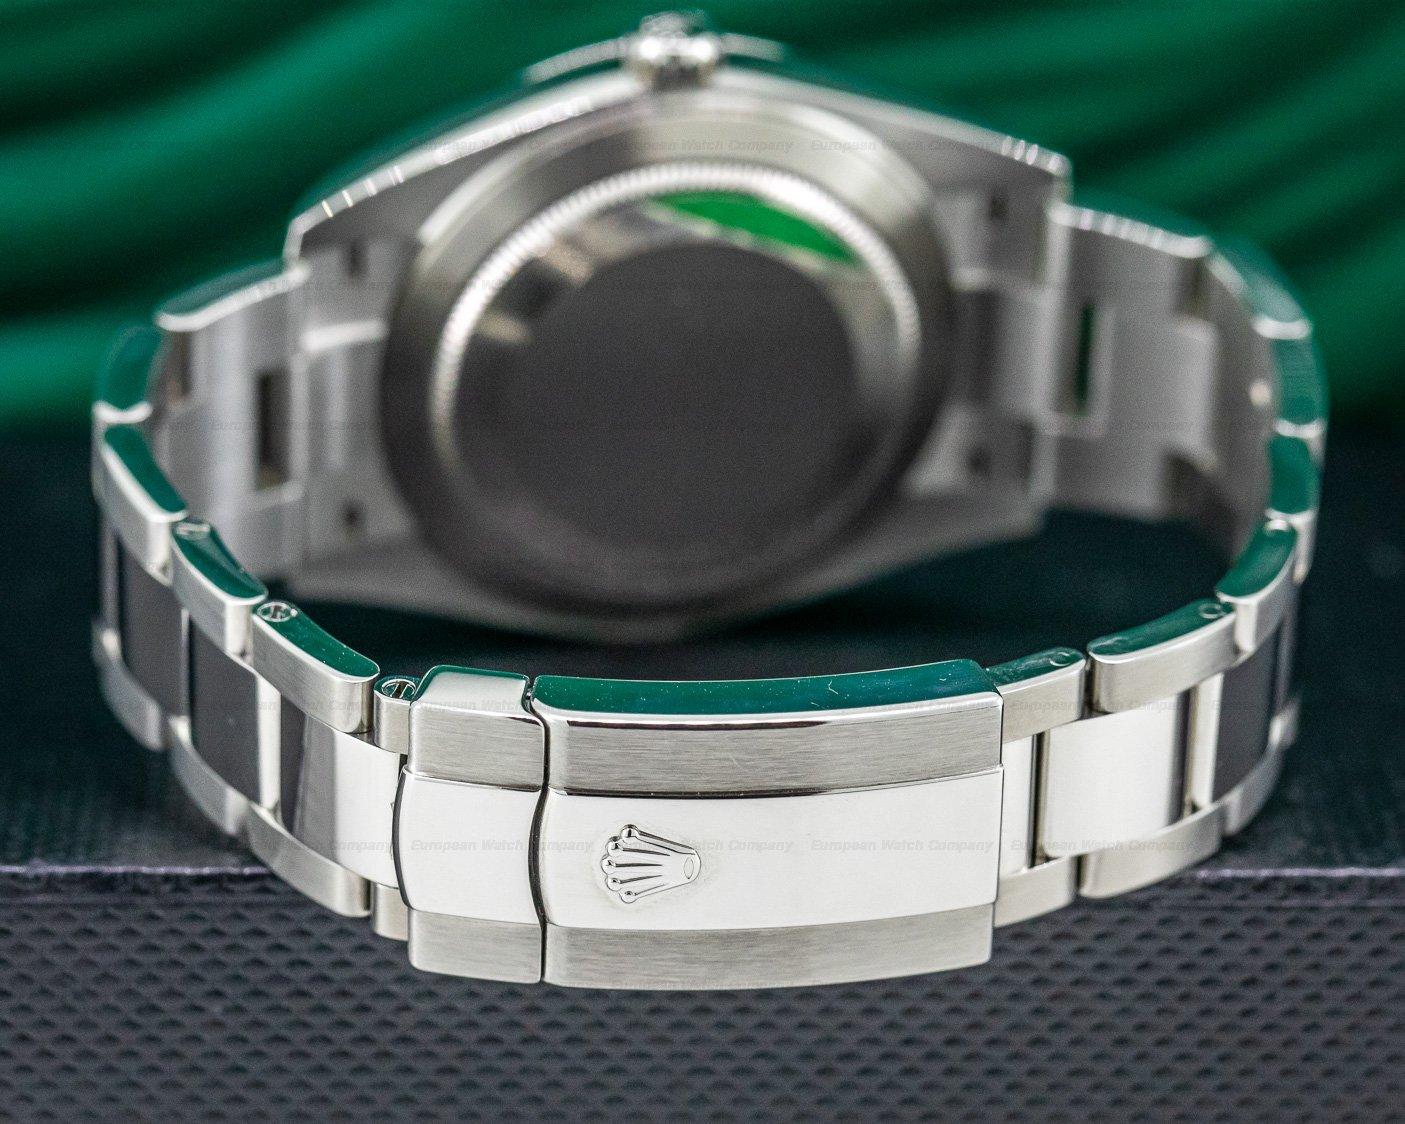 Rolex 126300 Datejust 41 Blue Stick Dial SS Oyster